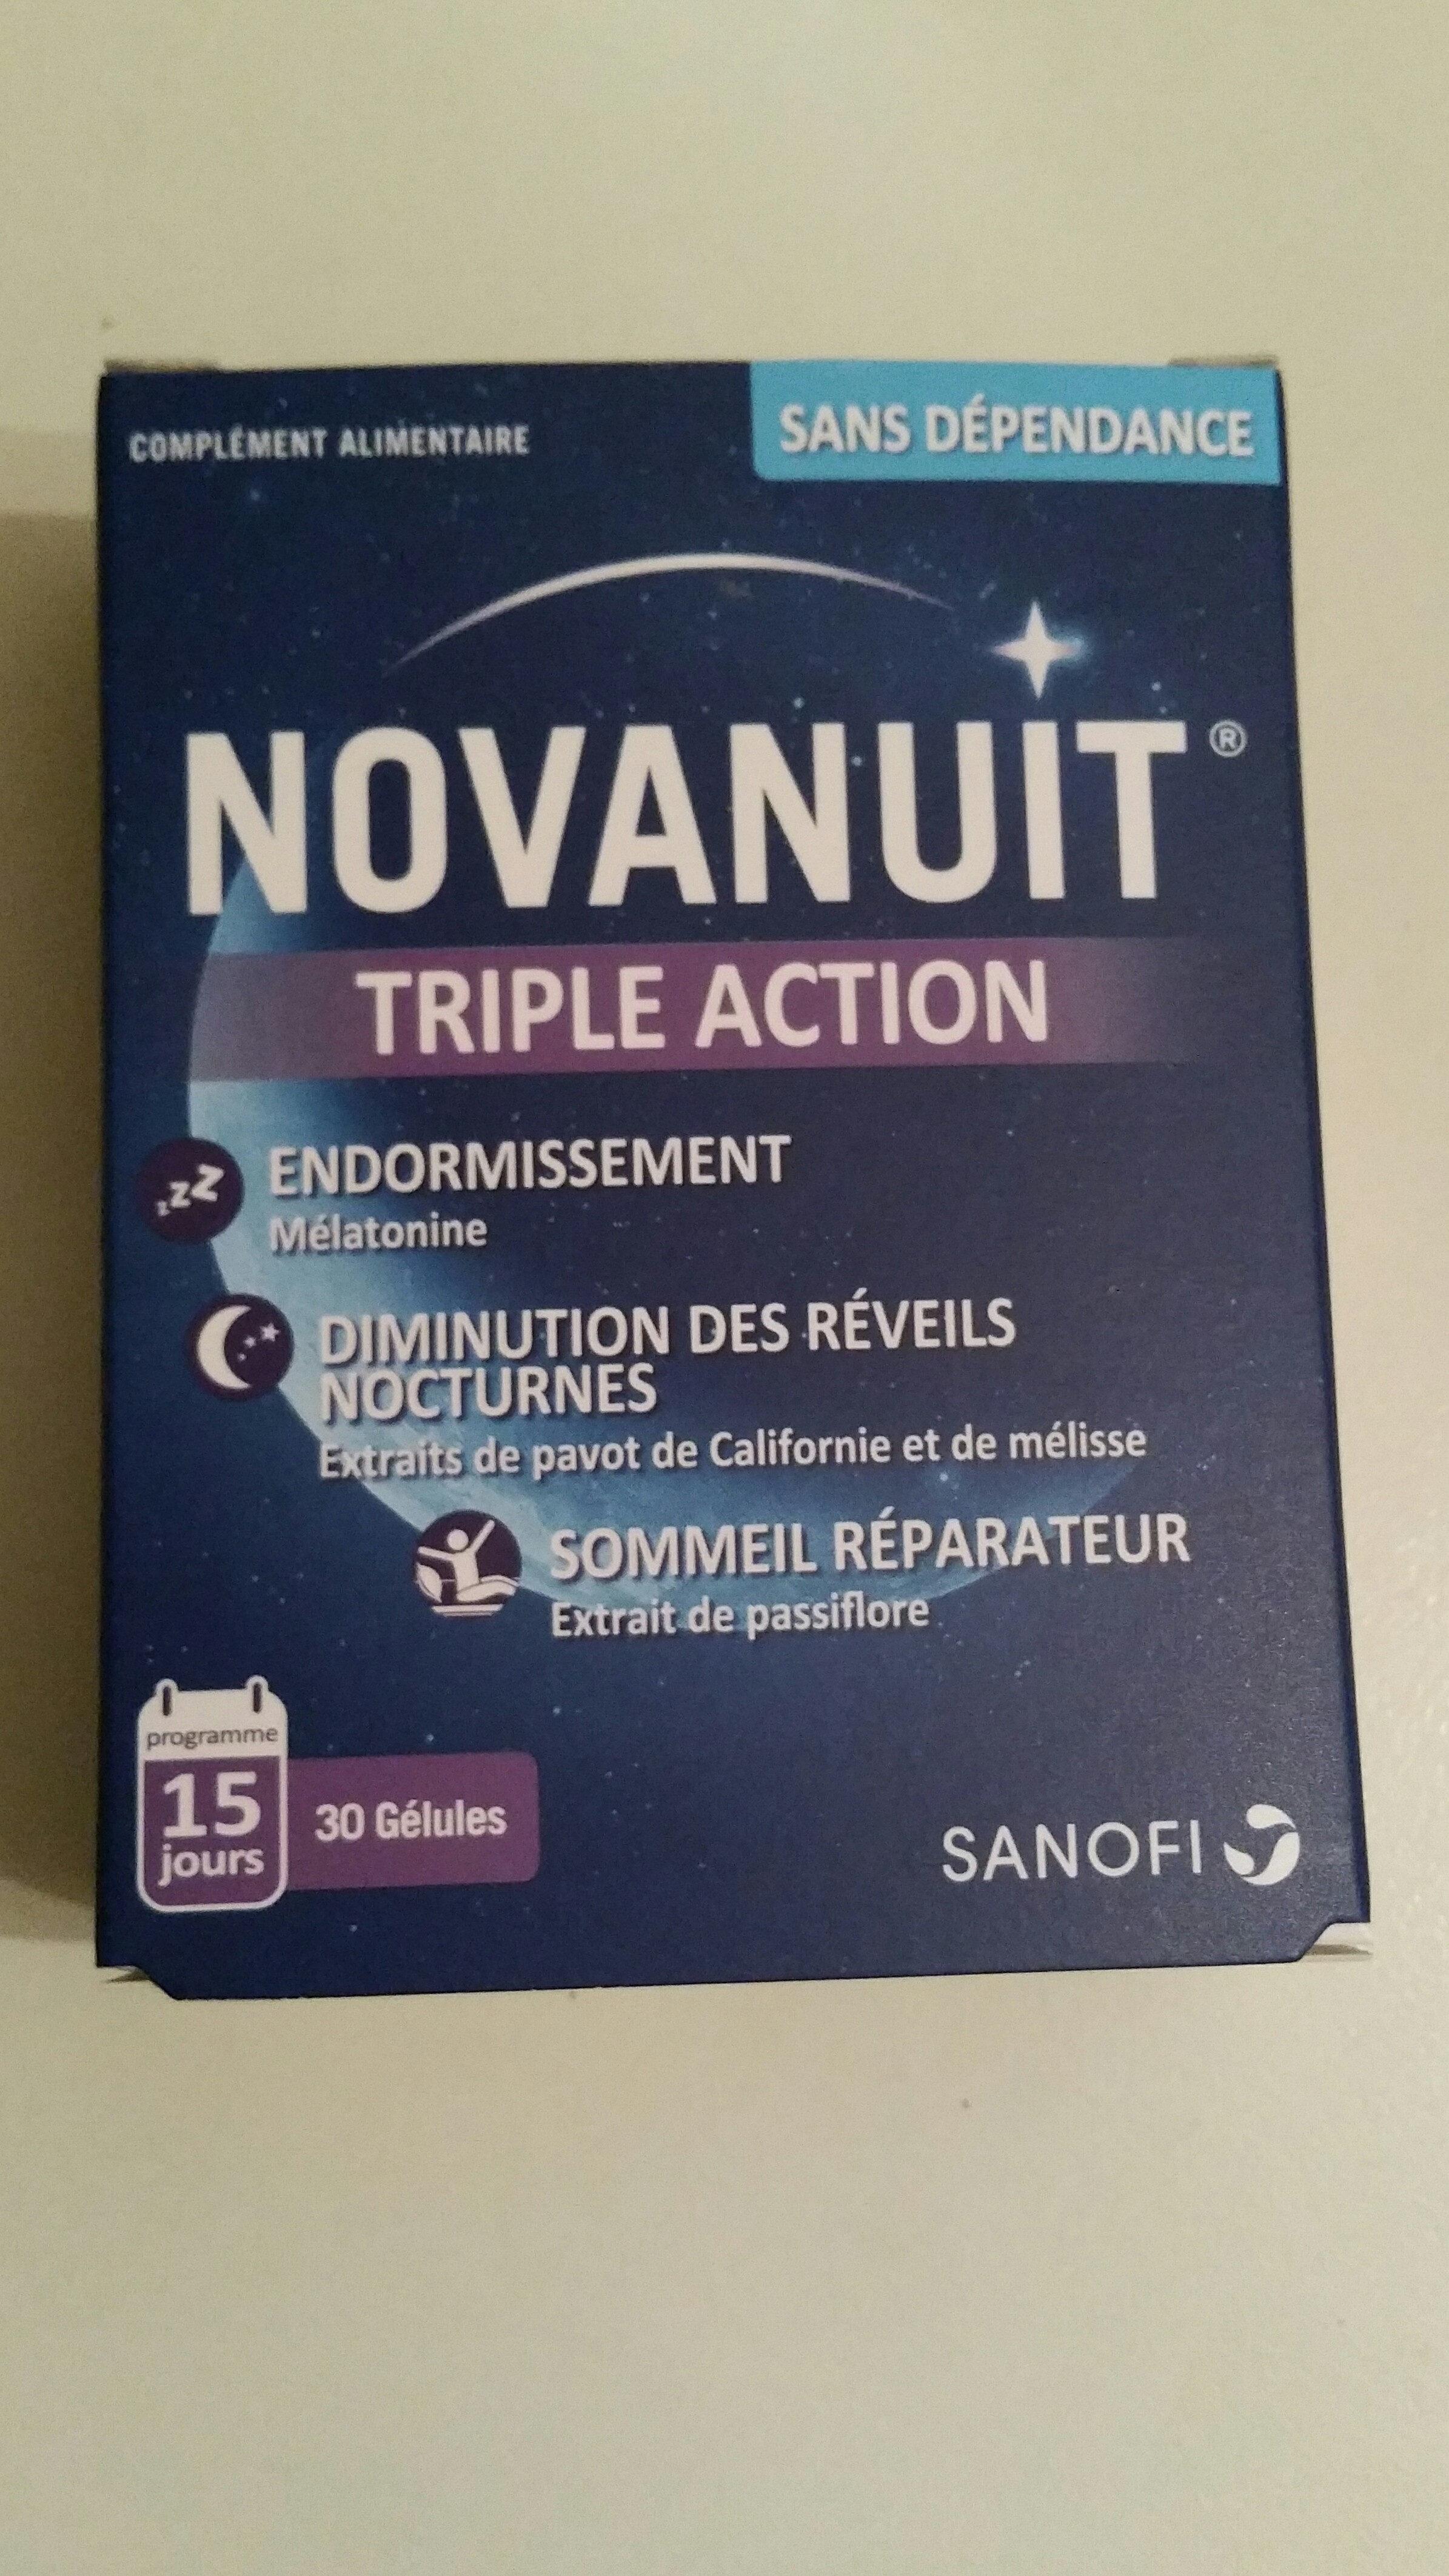 novanuit - Produit - fr